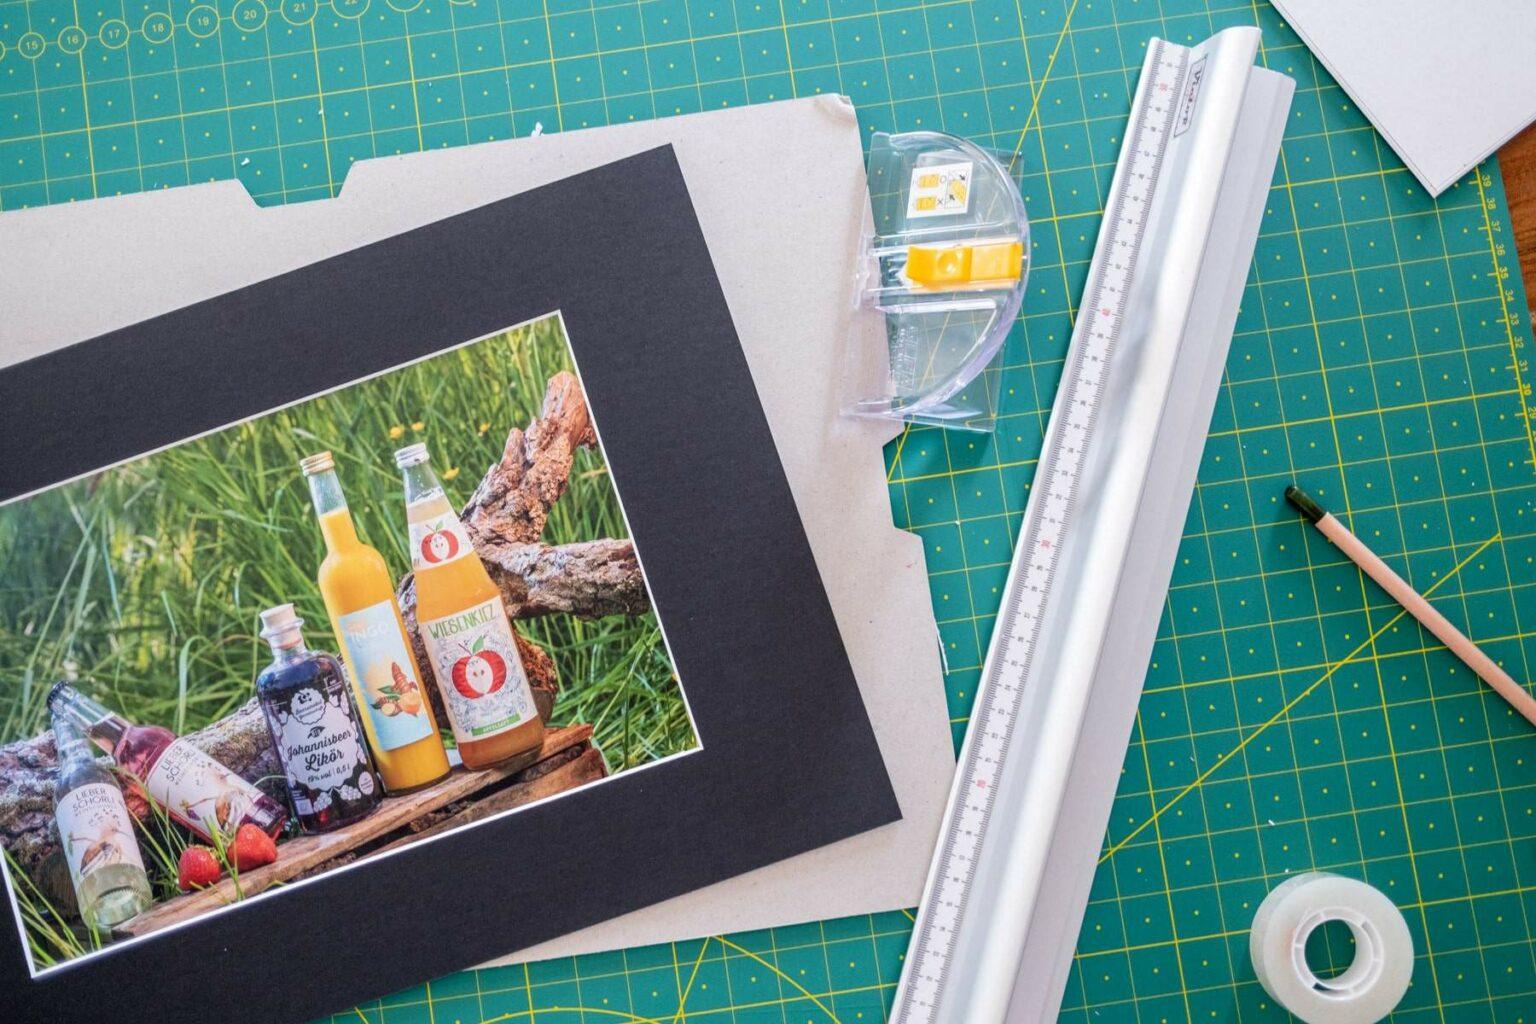 fotografenhandwerk ausbildung